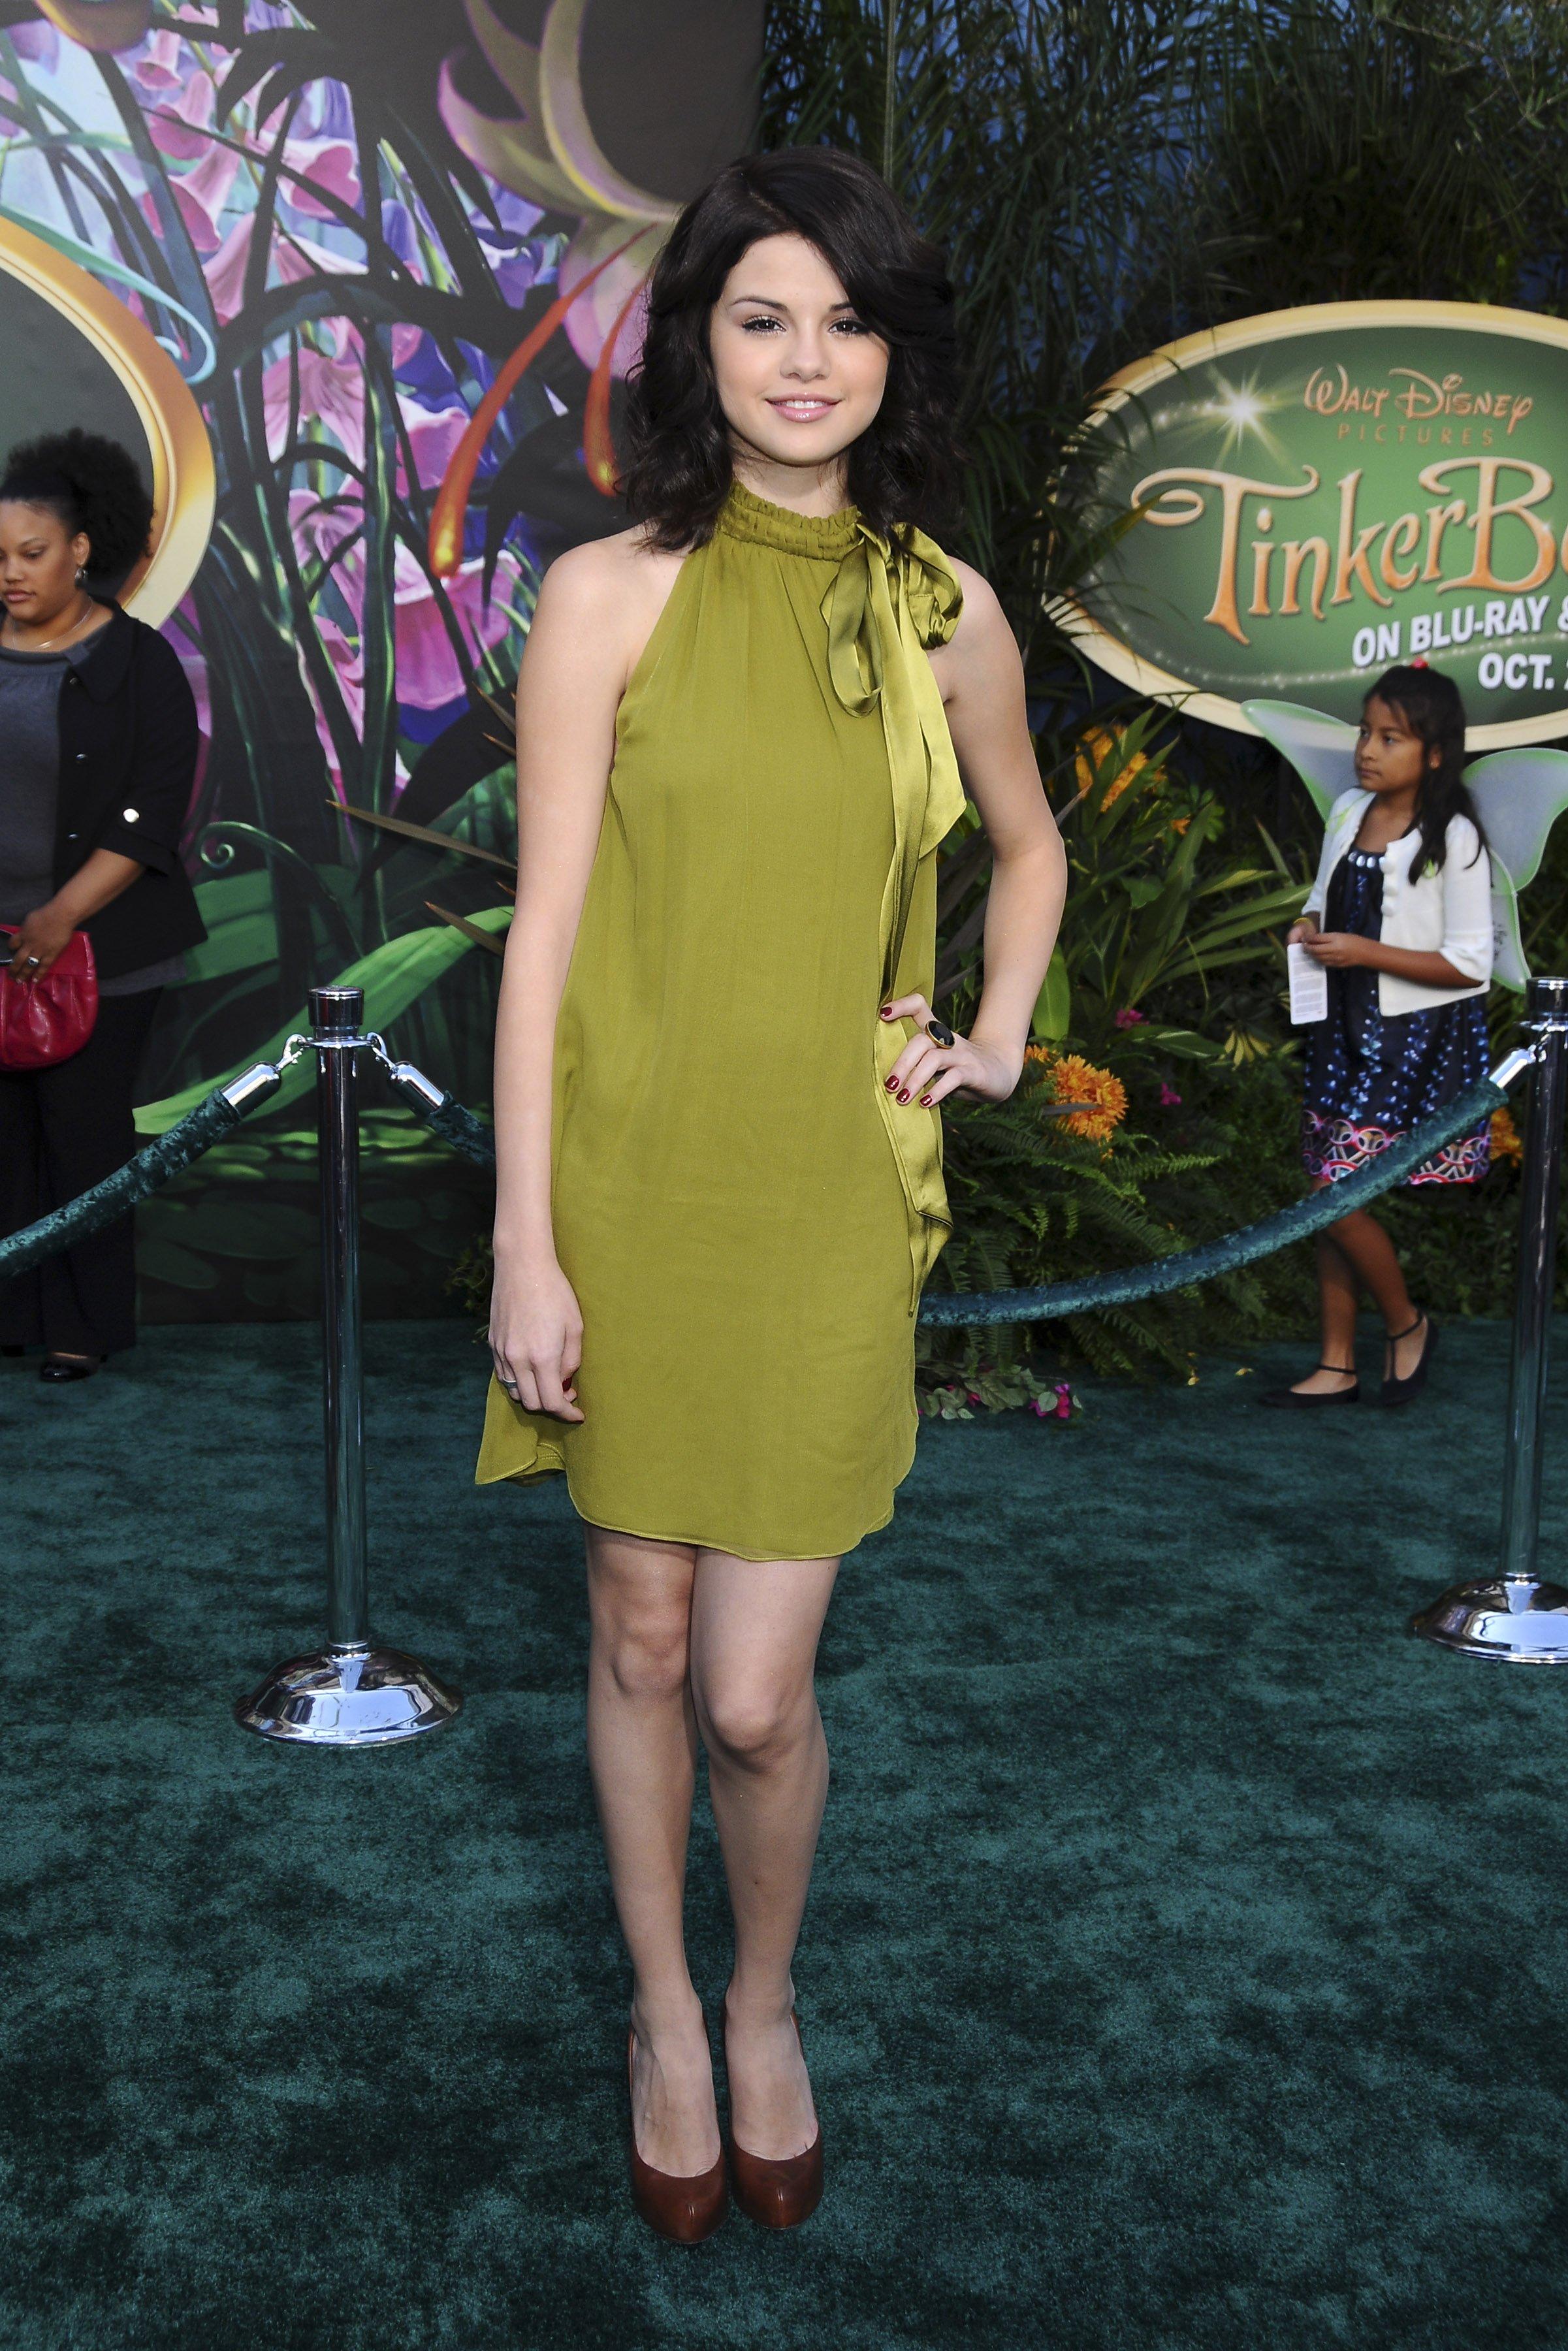 69297_Celebutopia-Selena_Gomez-Premiere_Of_Walt_Disney_Pictures_Tinker_Bell_Blu-Ray_2_DVD-08_122_899lo.jpg